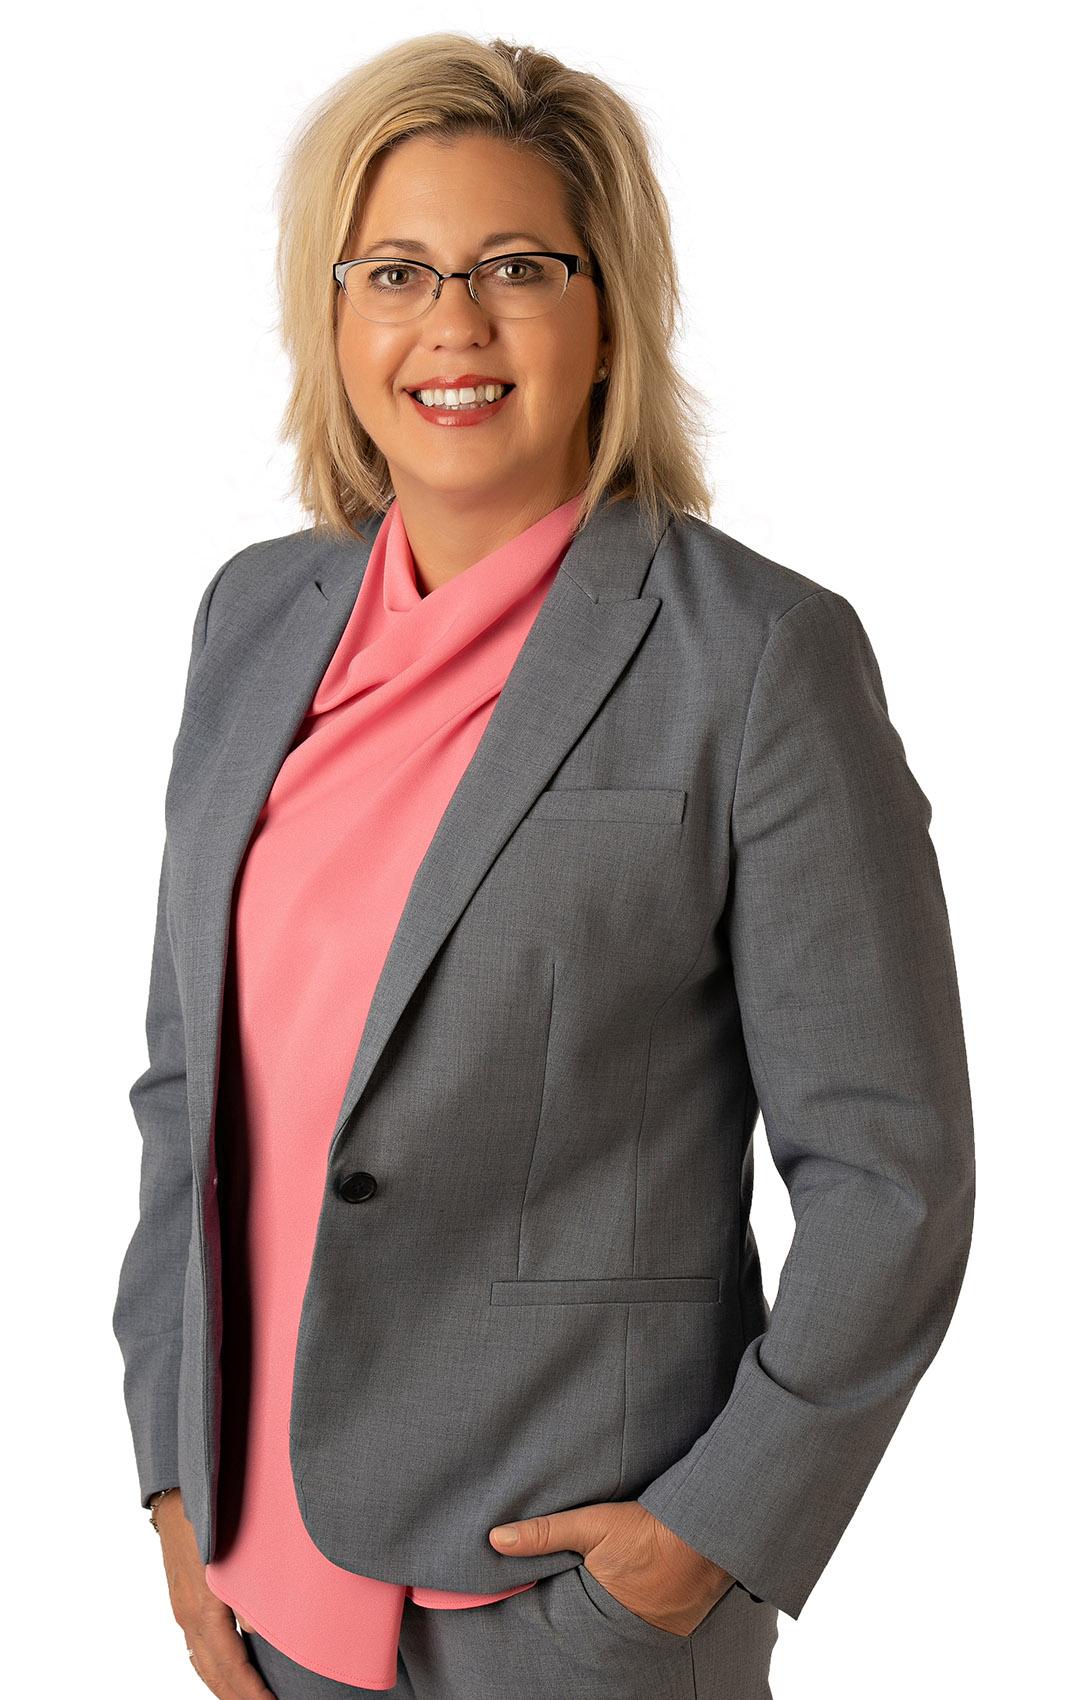 Wendy Russell Wiener